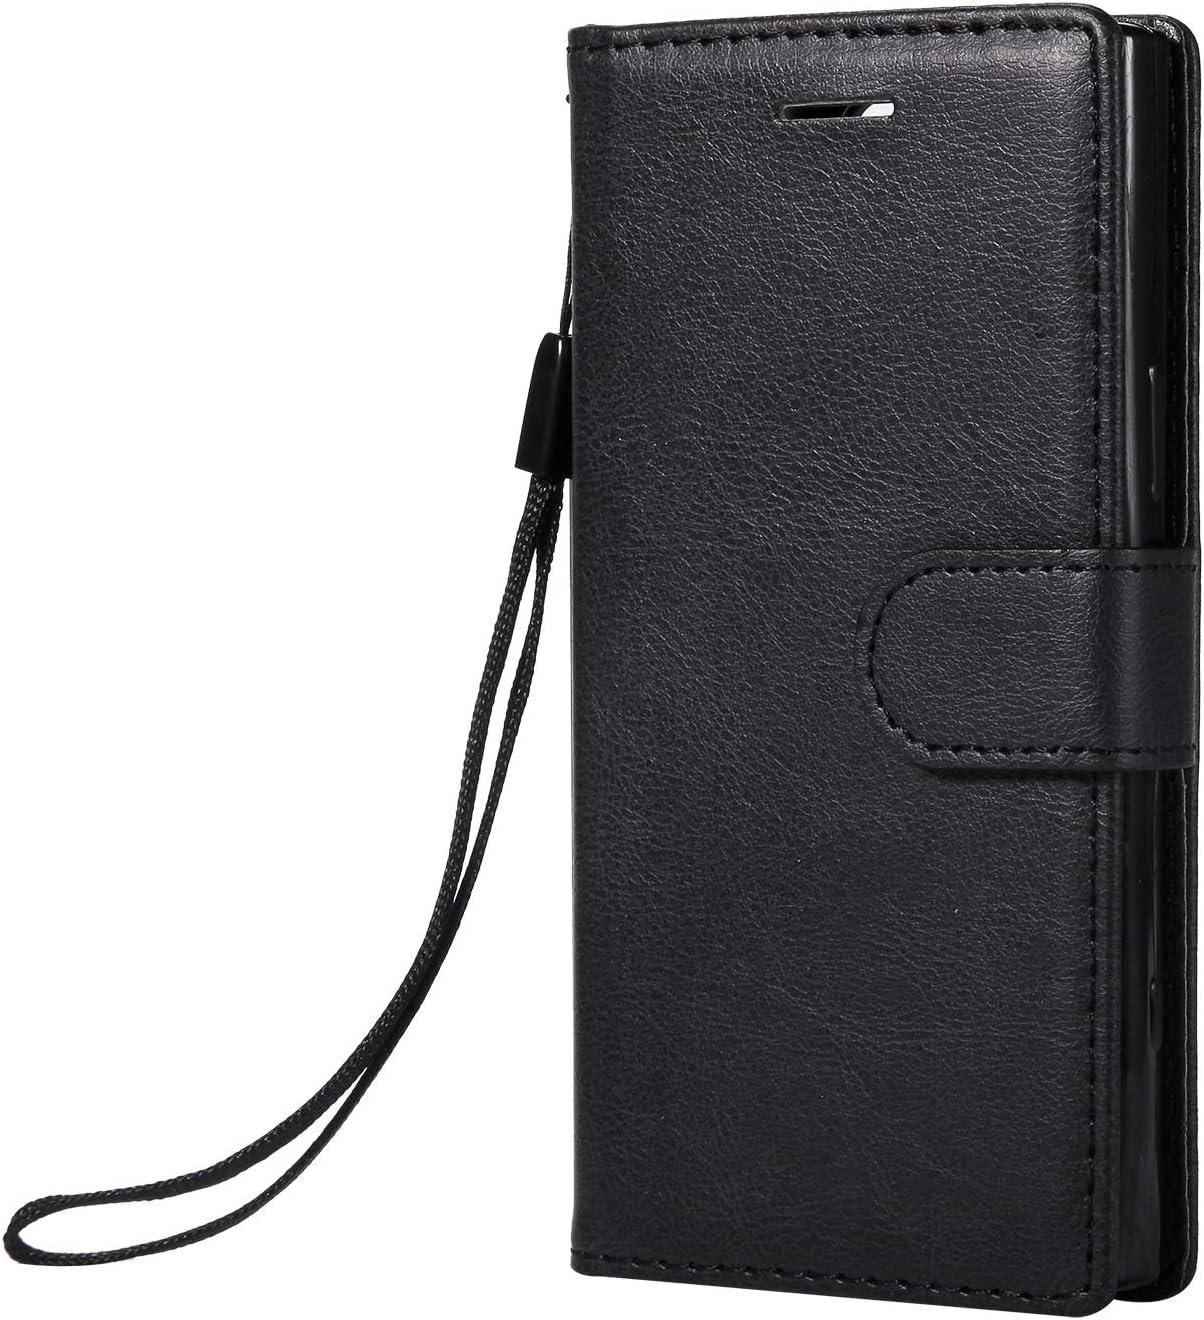 NEXCURIO Sony Xperia XZ1コンパクト / XZ1 Compact/docomo SO-02K ケース 手帳型 PU レザーケース 耐衝撃 カード収納 スタンド機能 マグネット式 エクスぺリアXZ1 Compact ケース 携帯カバー おしゃれ - NEKTU13554 黒